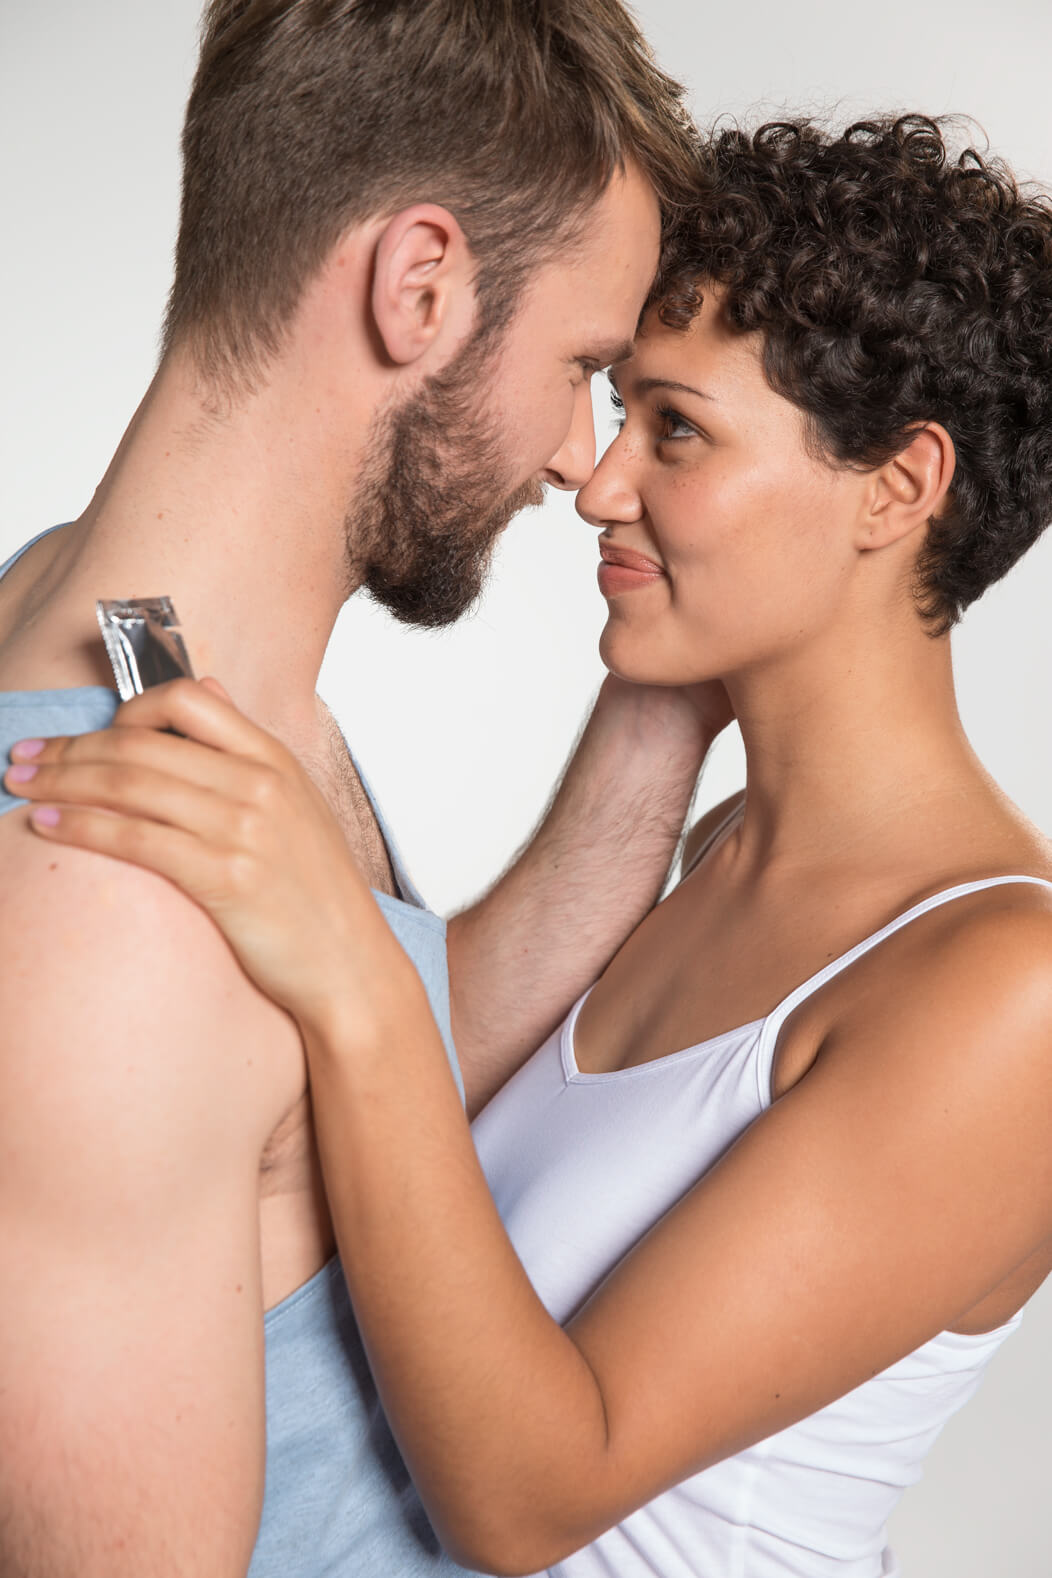 Heterosexuelles Paar in leichter Bekleidung umarmt sich. Die Frau hält ein verpacktes Kondom.